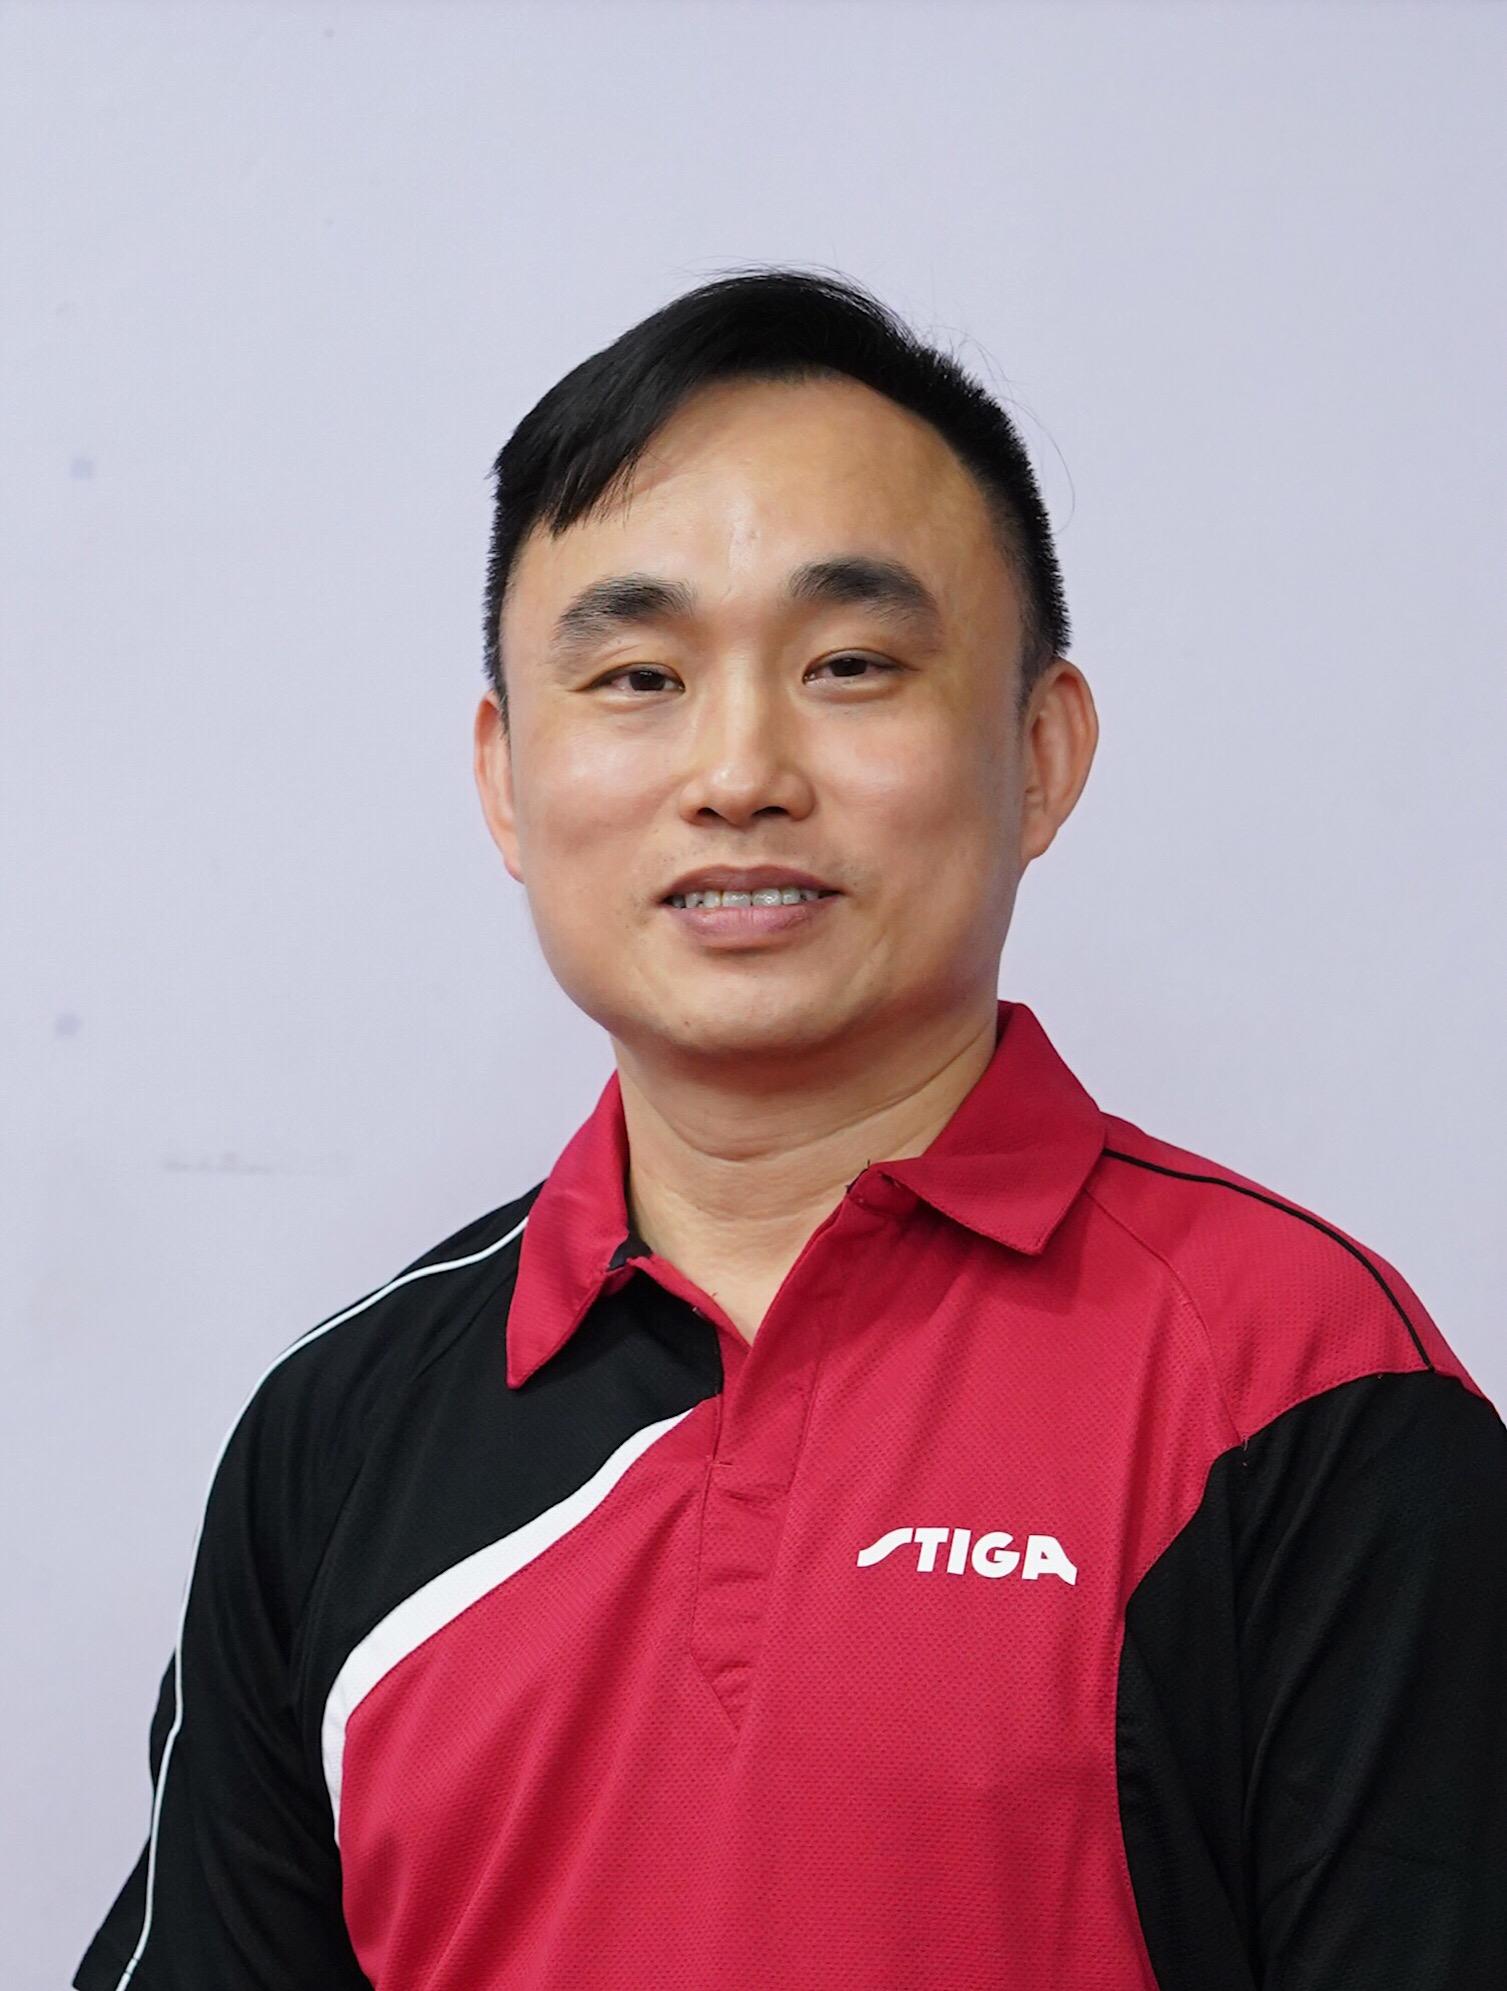 Koh Chin Guan